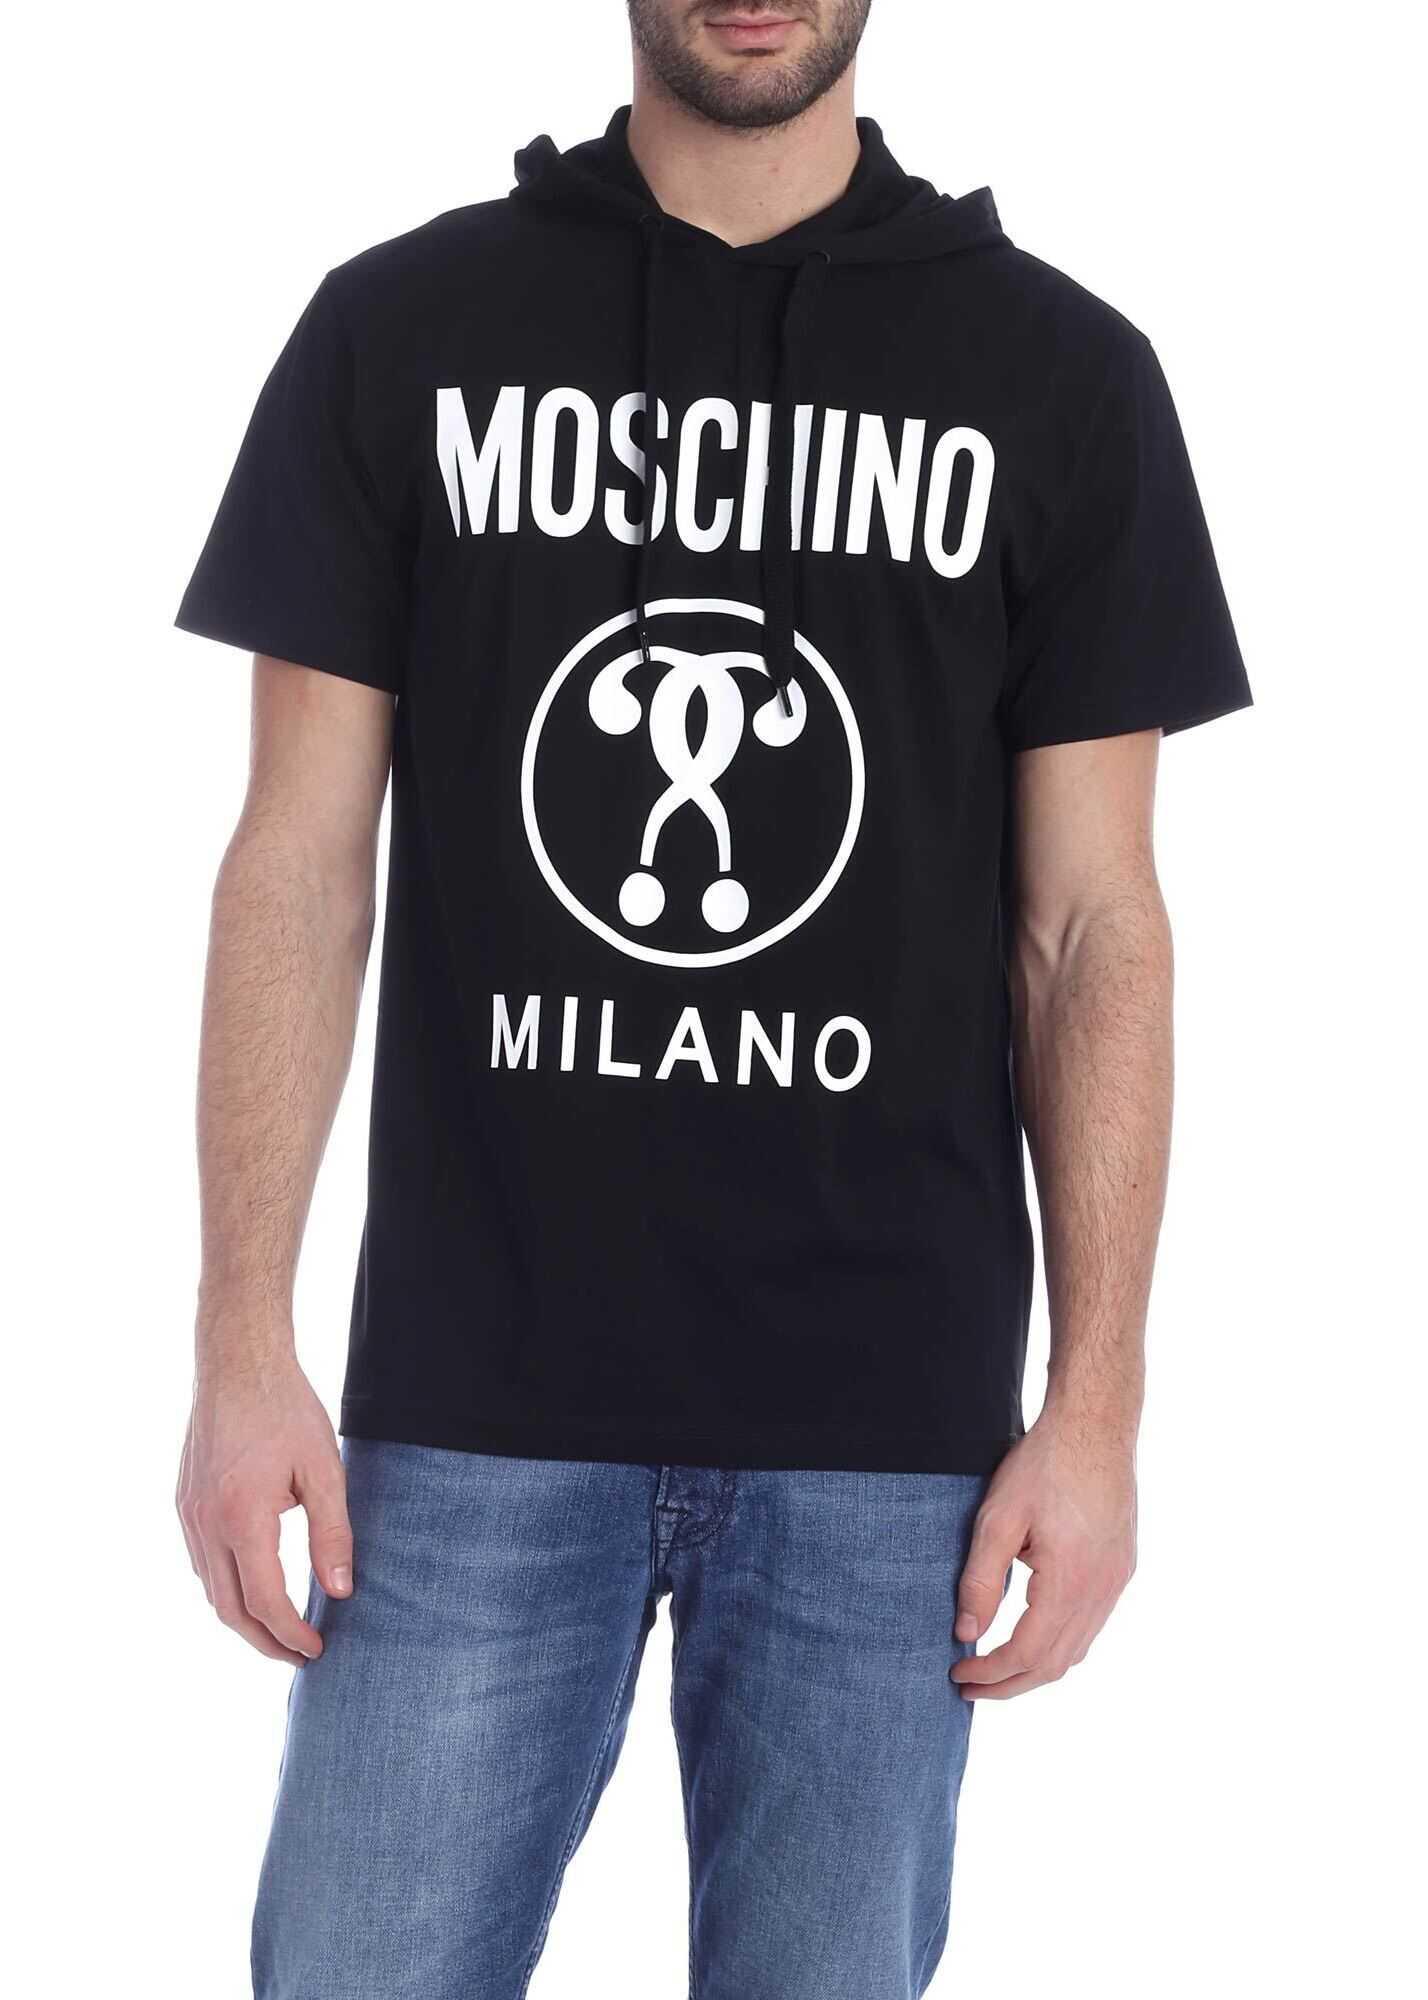 Moschino Hooded T-Shirt In Black Black